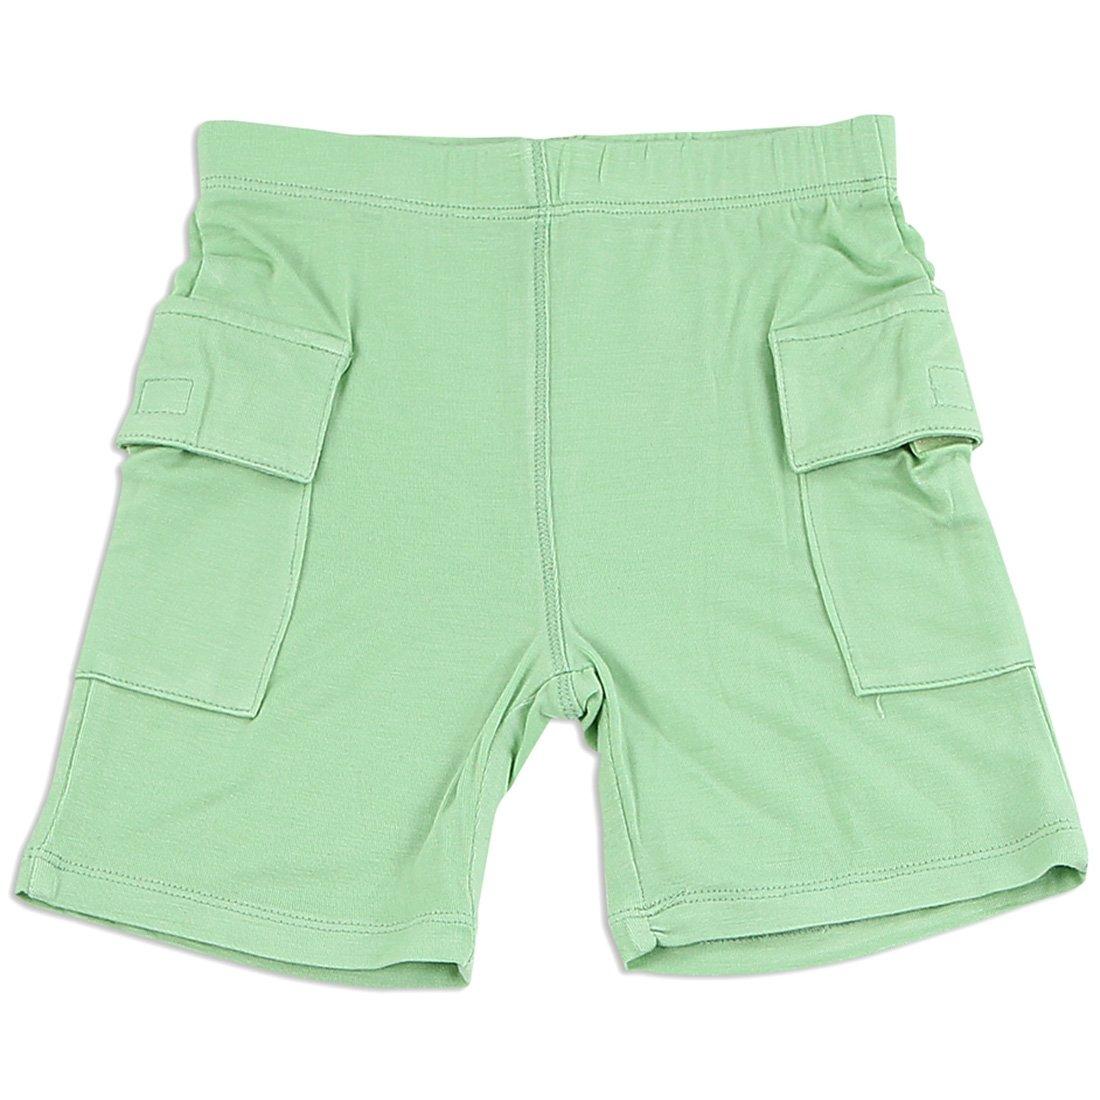 Silkberry Baby Bamboo Baby-Boys Cargo Pocket Shorts